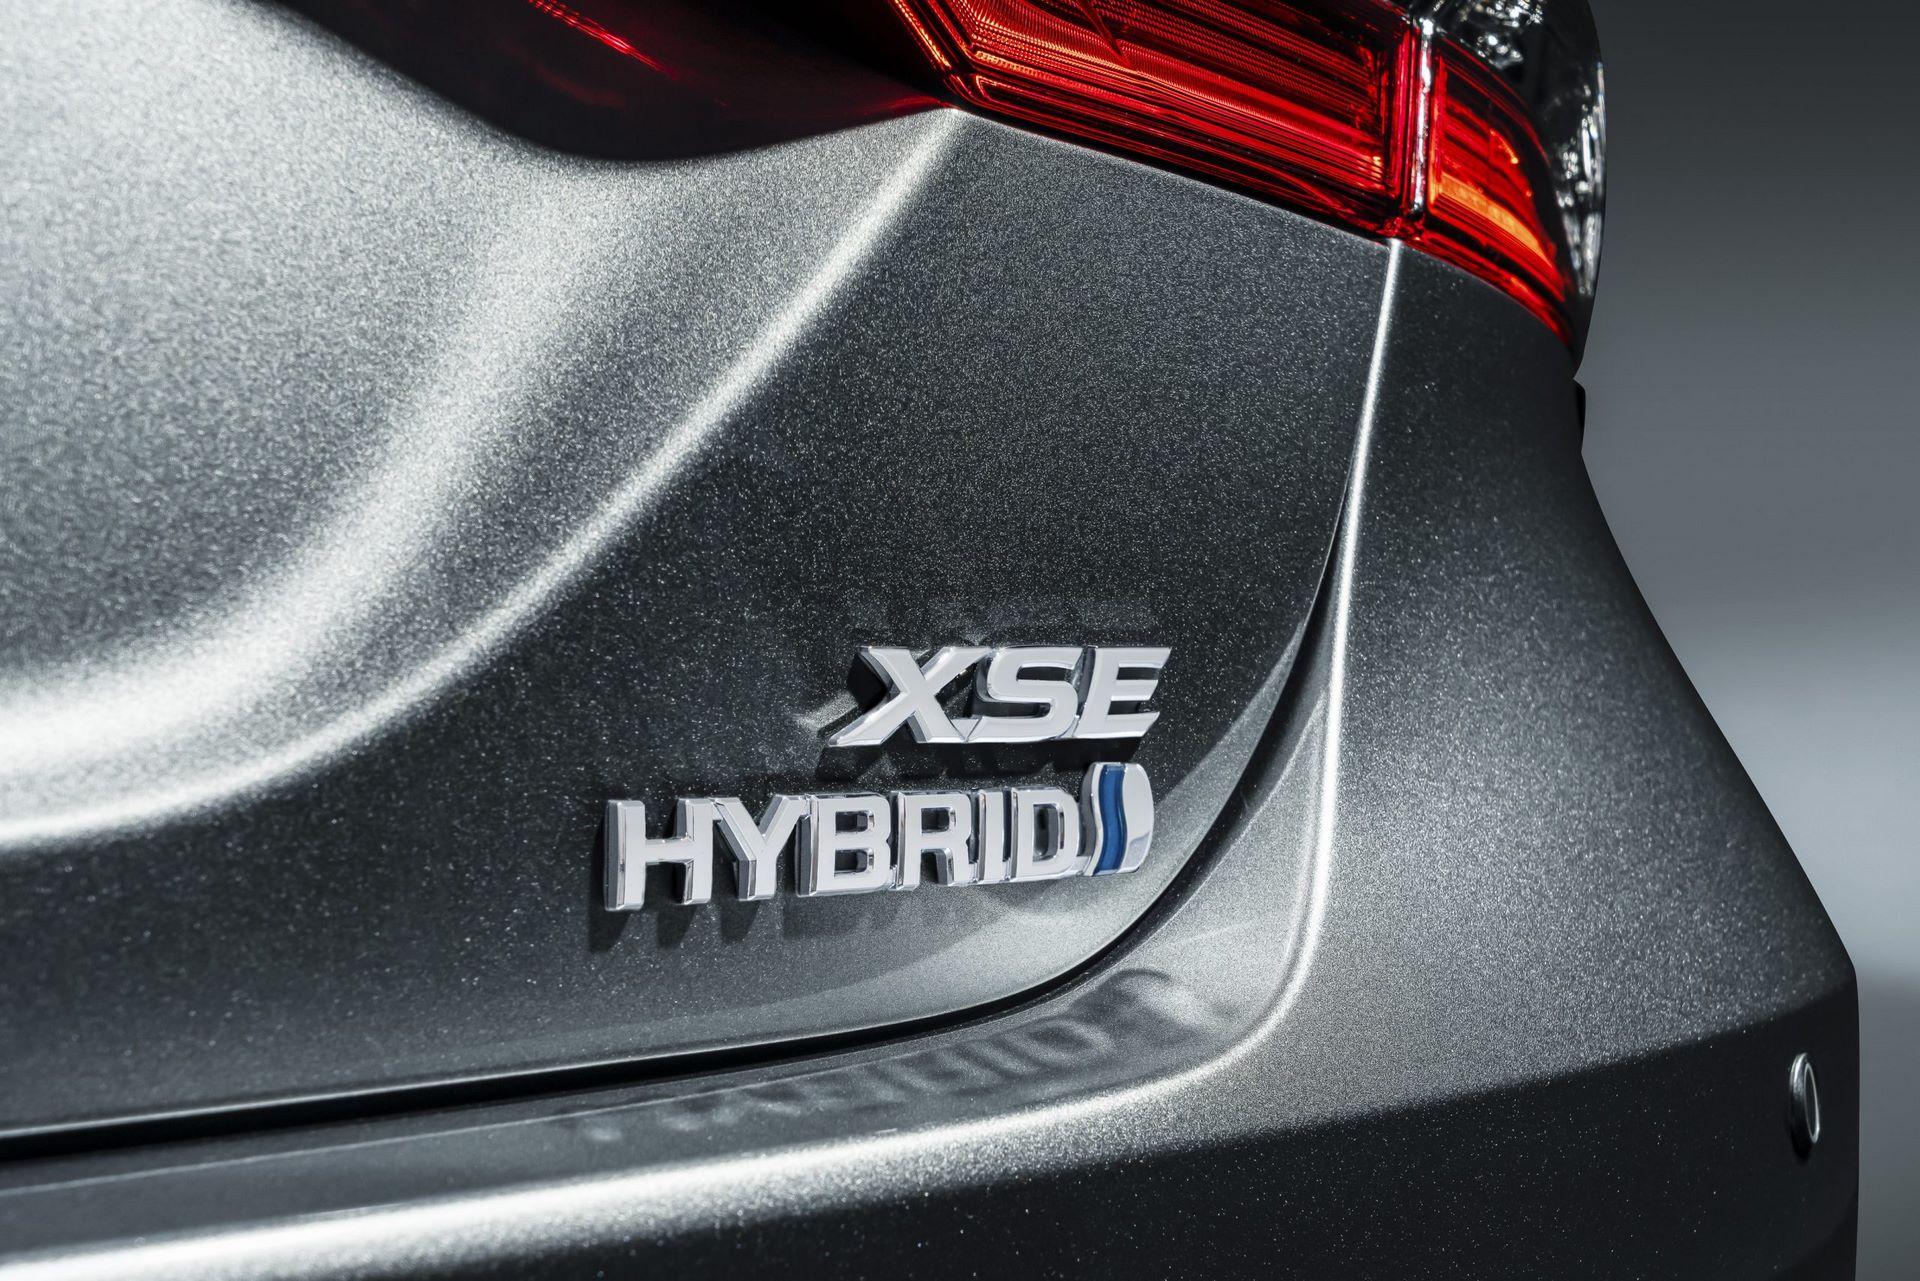 MY21_Camry_XSE_Hybrid_006-scaled